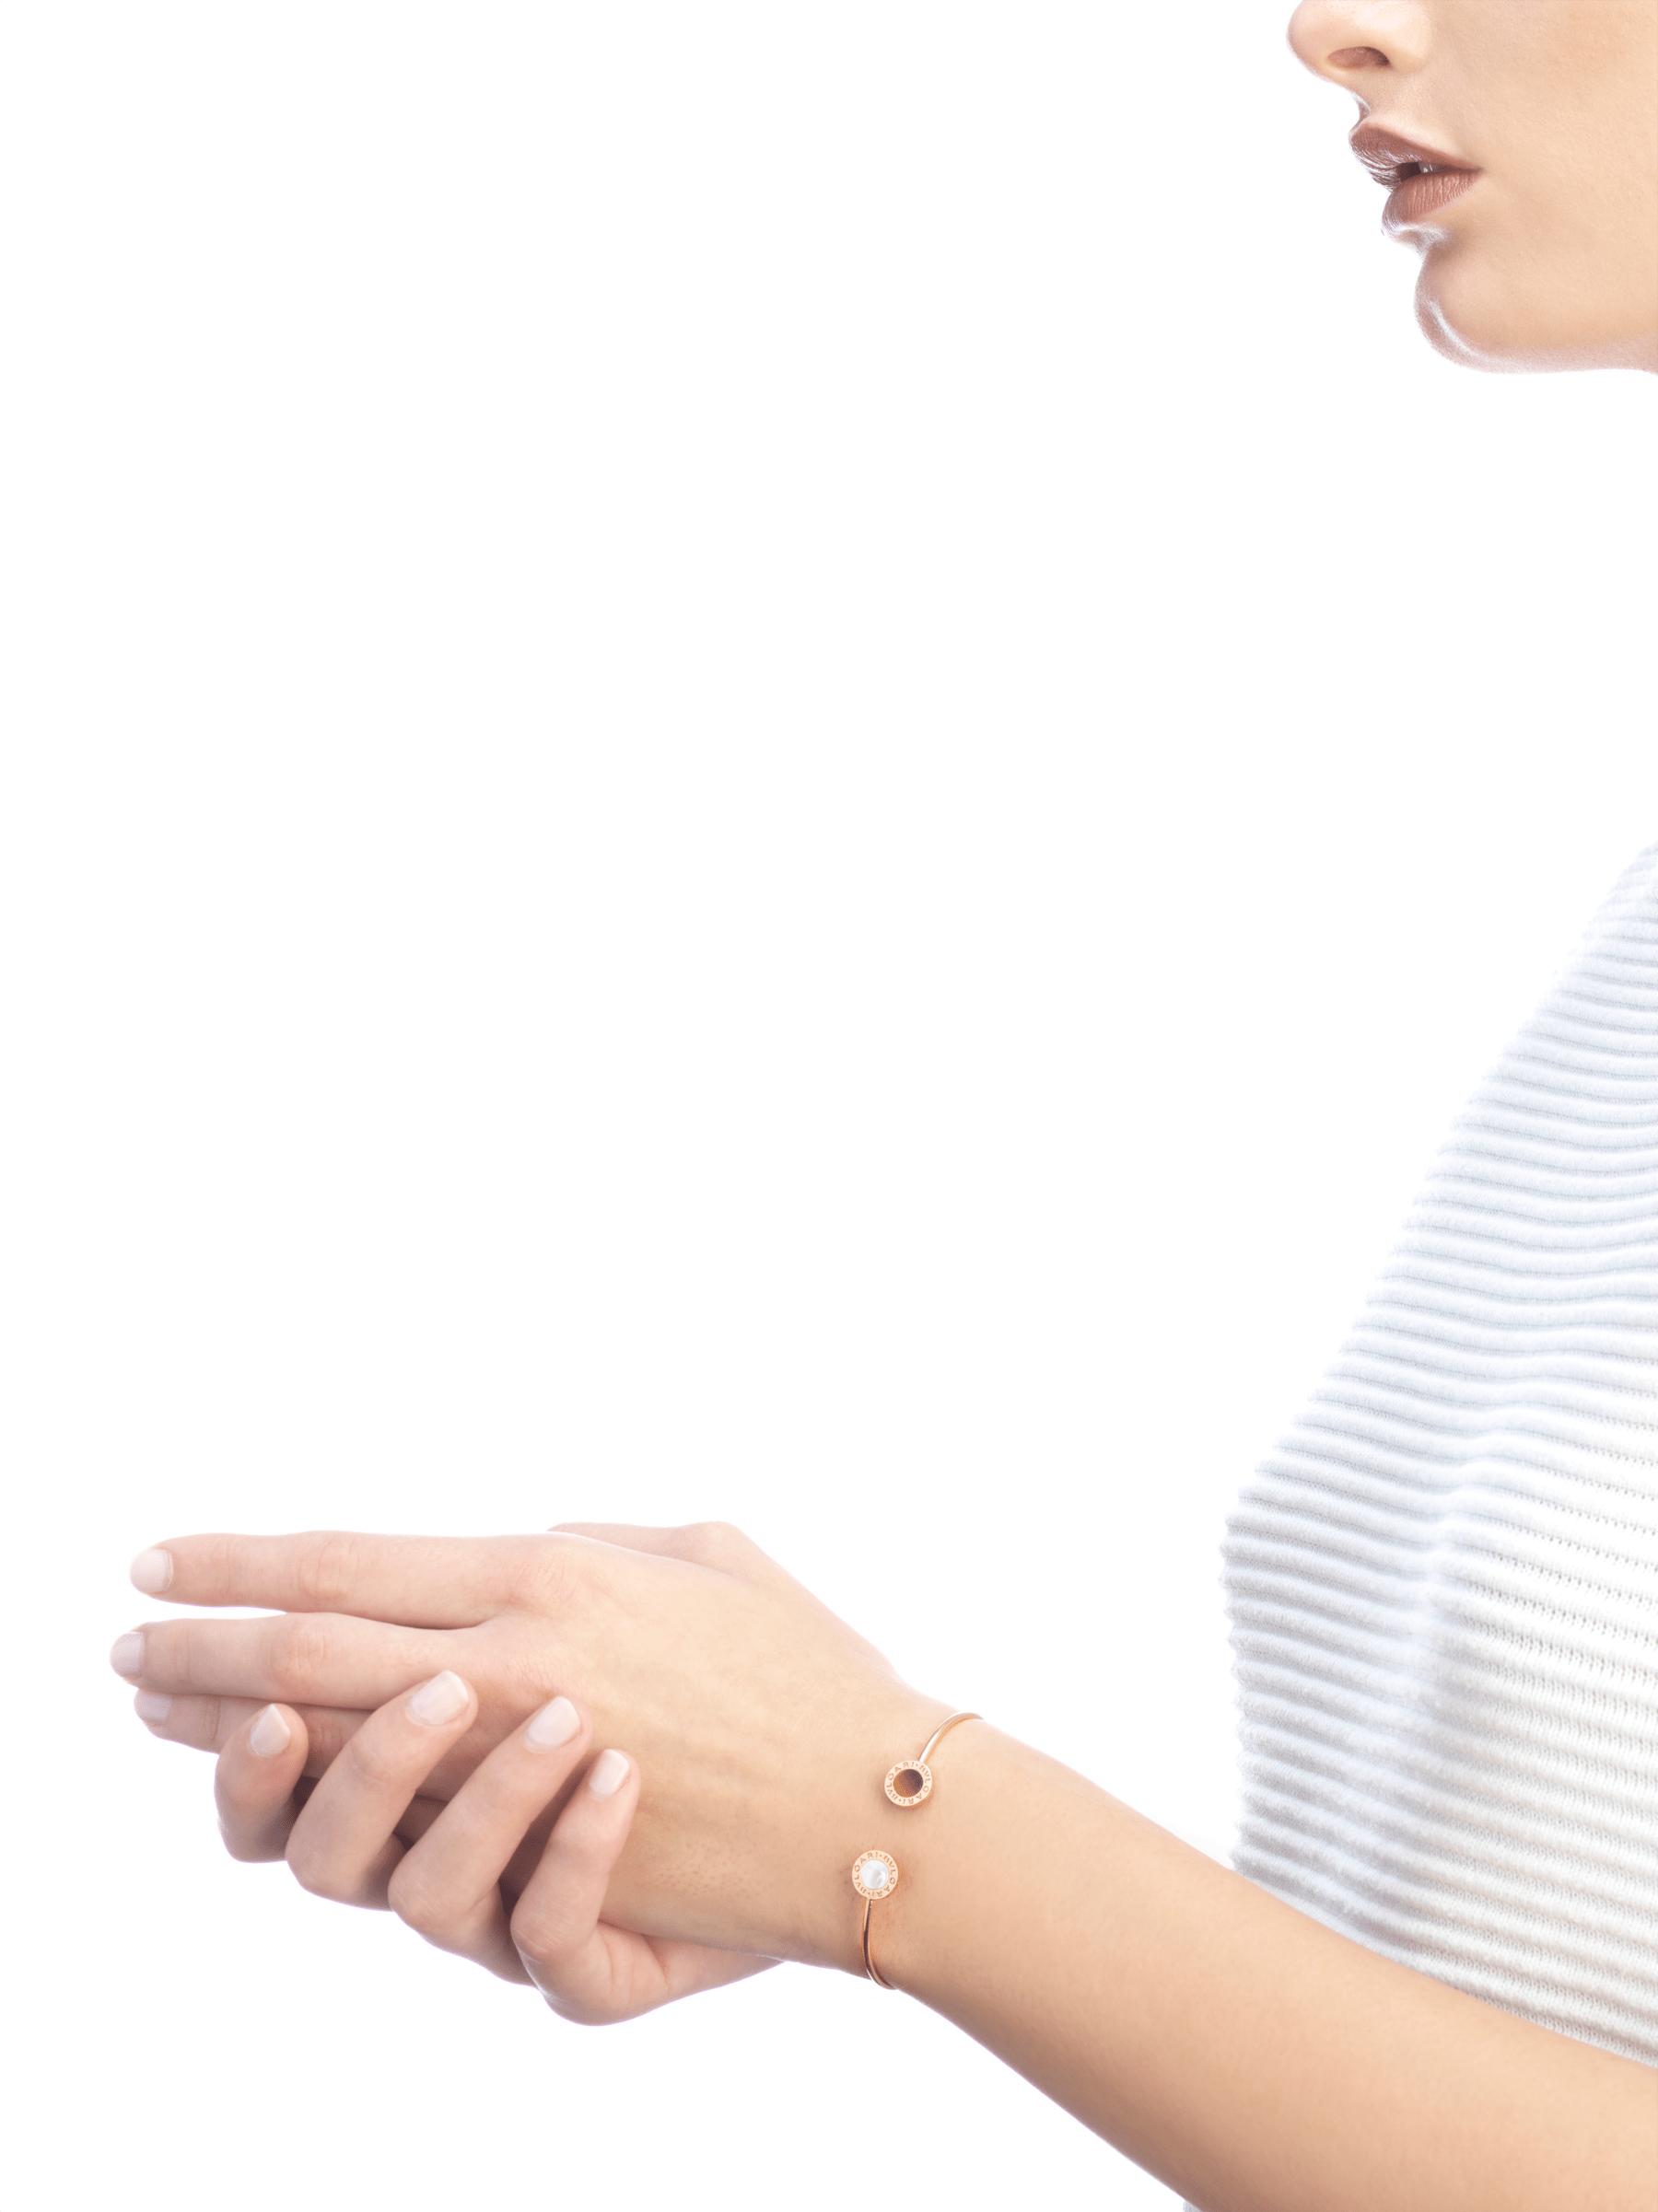 BVLGARI BVLGARI系列18K玫瑰金手镯,镶嵌珍珠母贝和虎眼石 BR858623 image 3